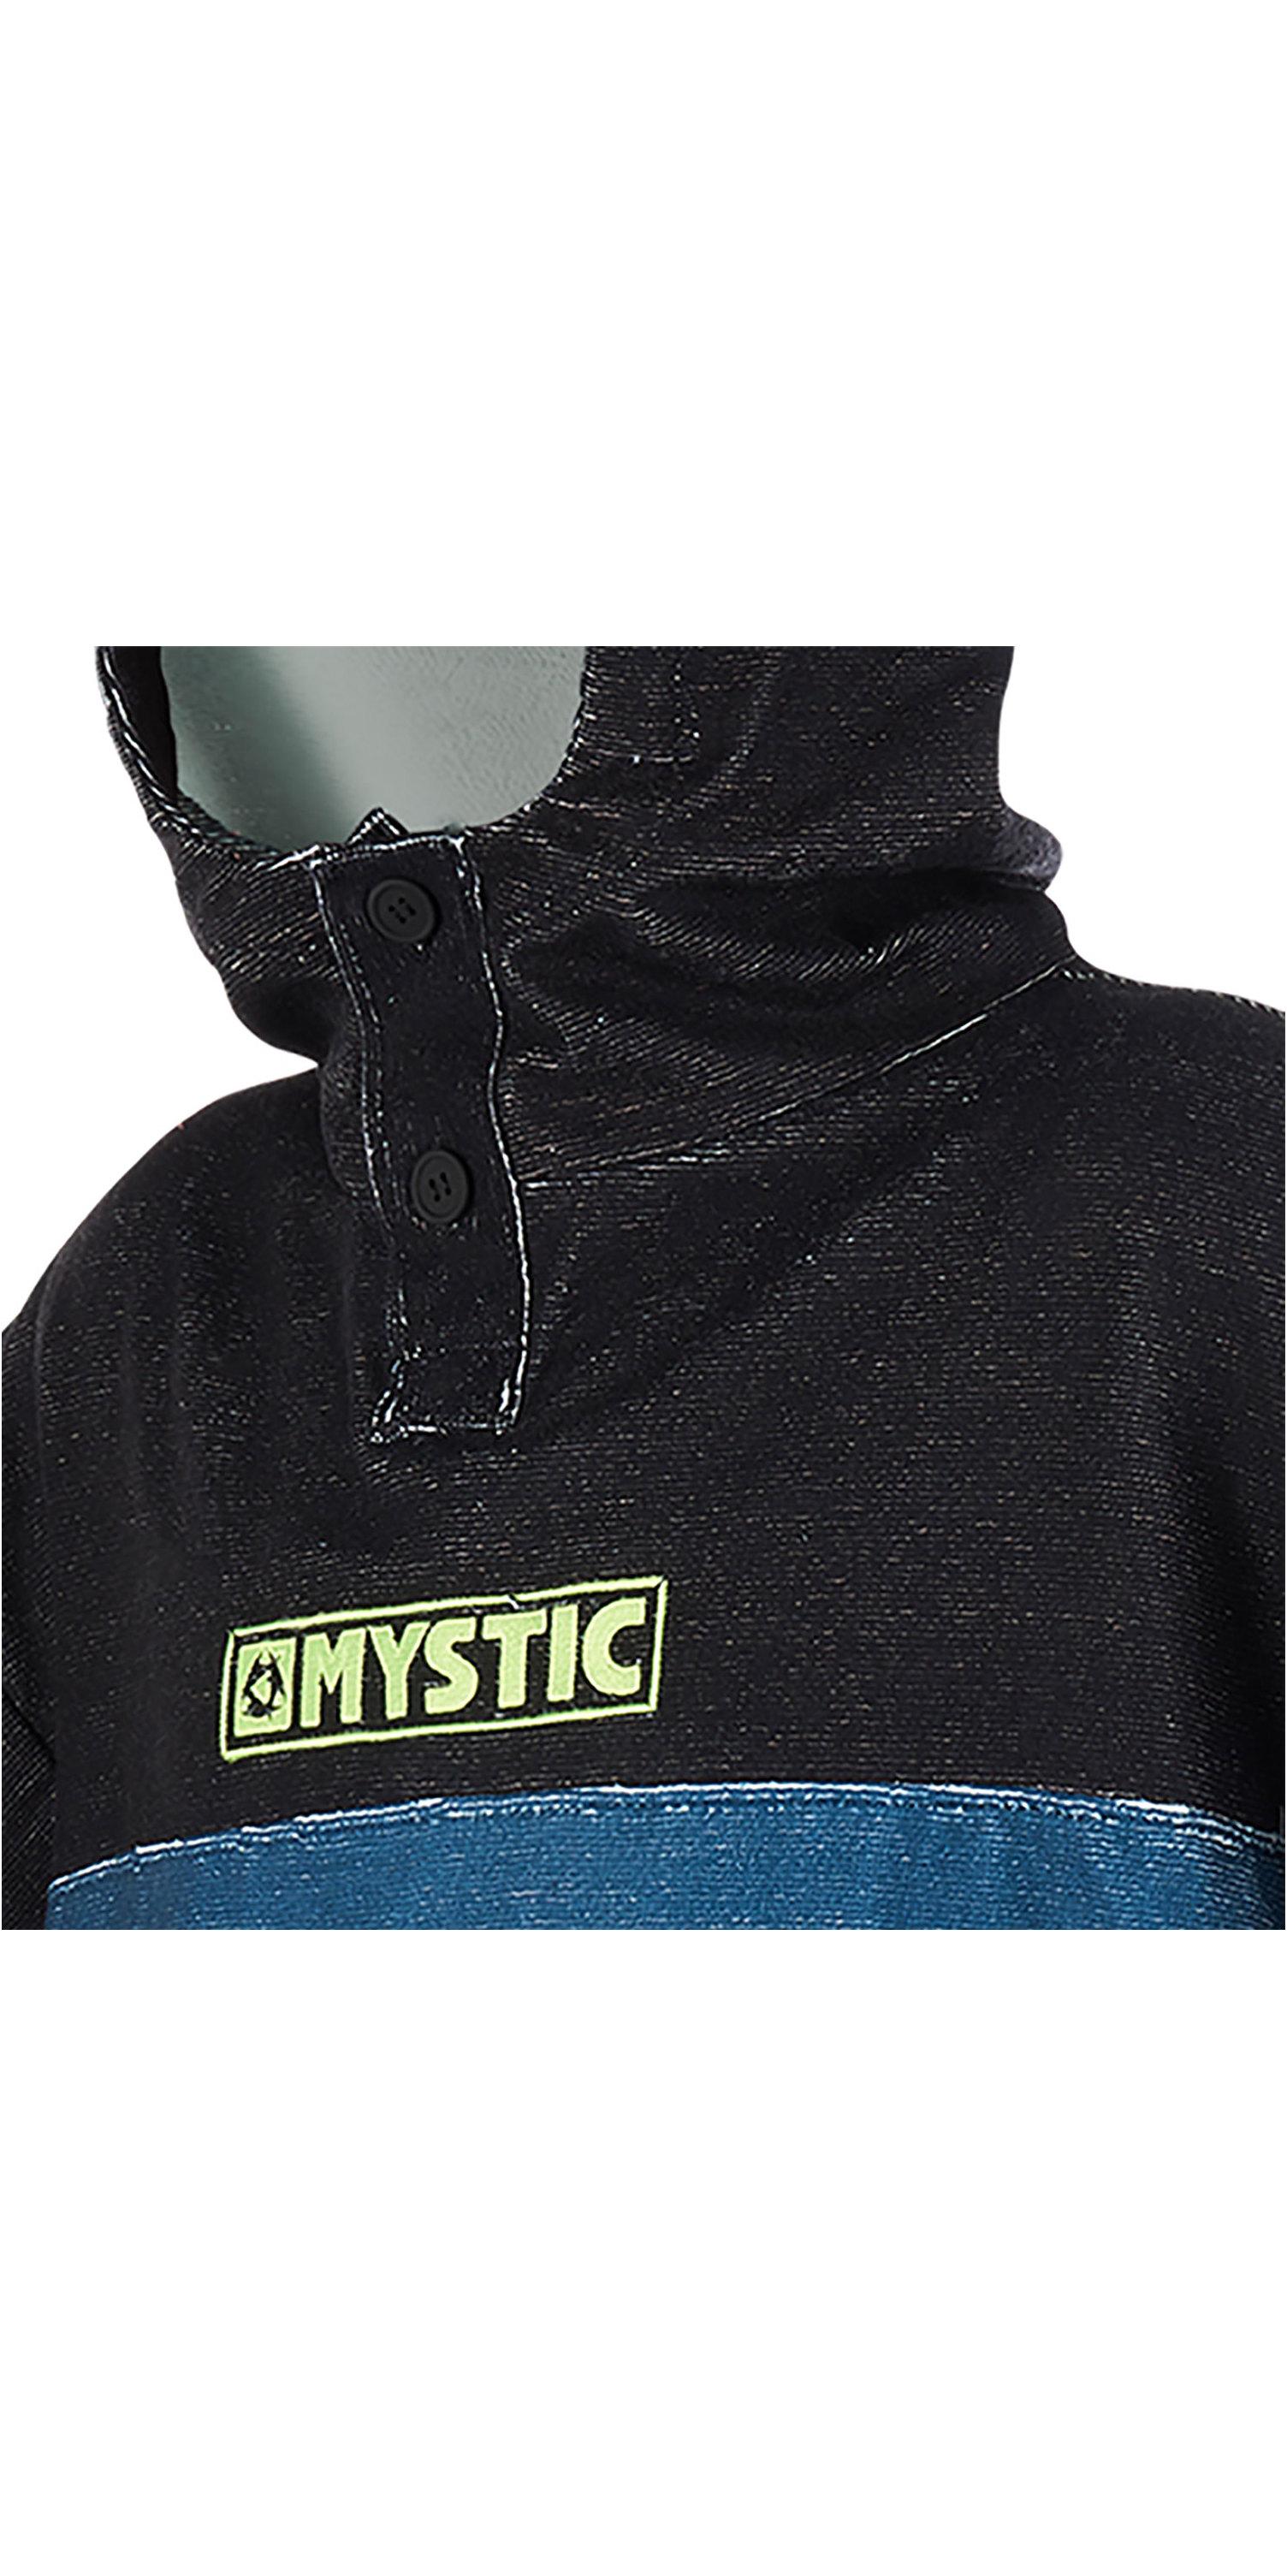 2019 Mystic Regular Poncho / Change Robe Teal 190169